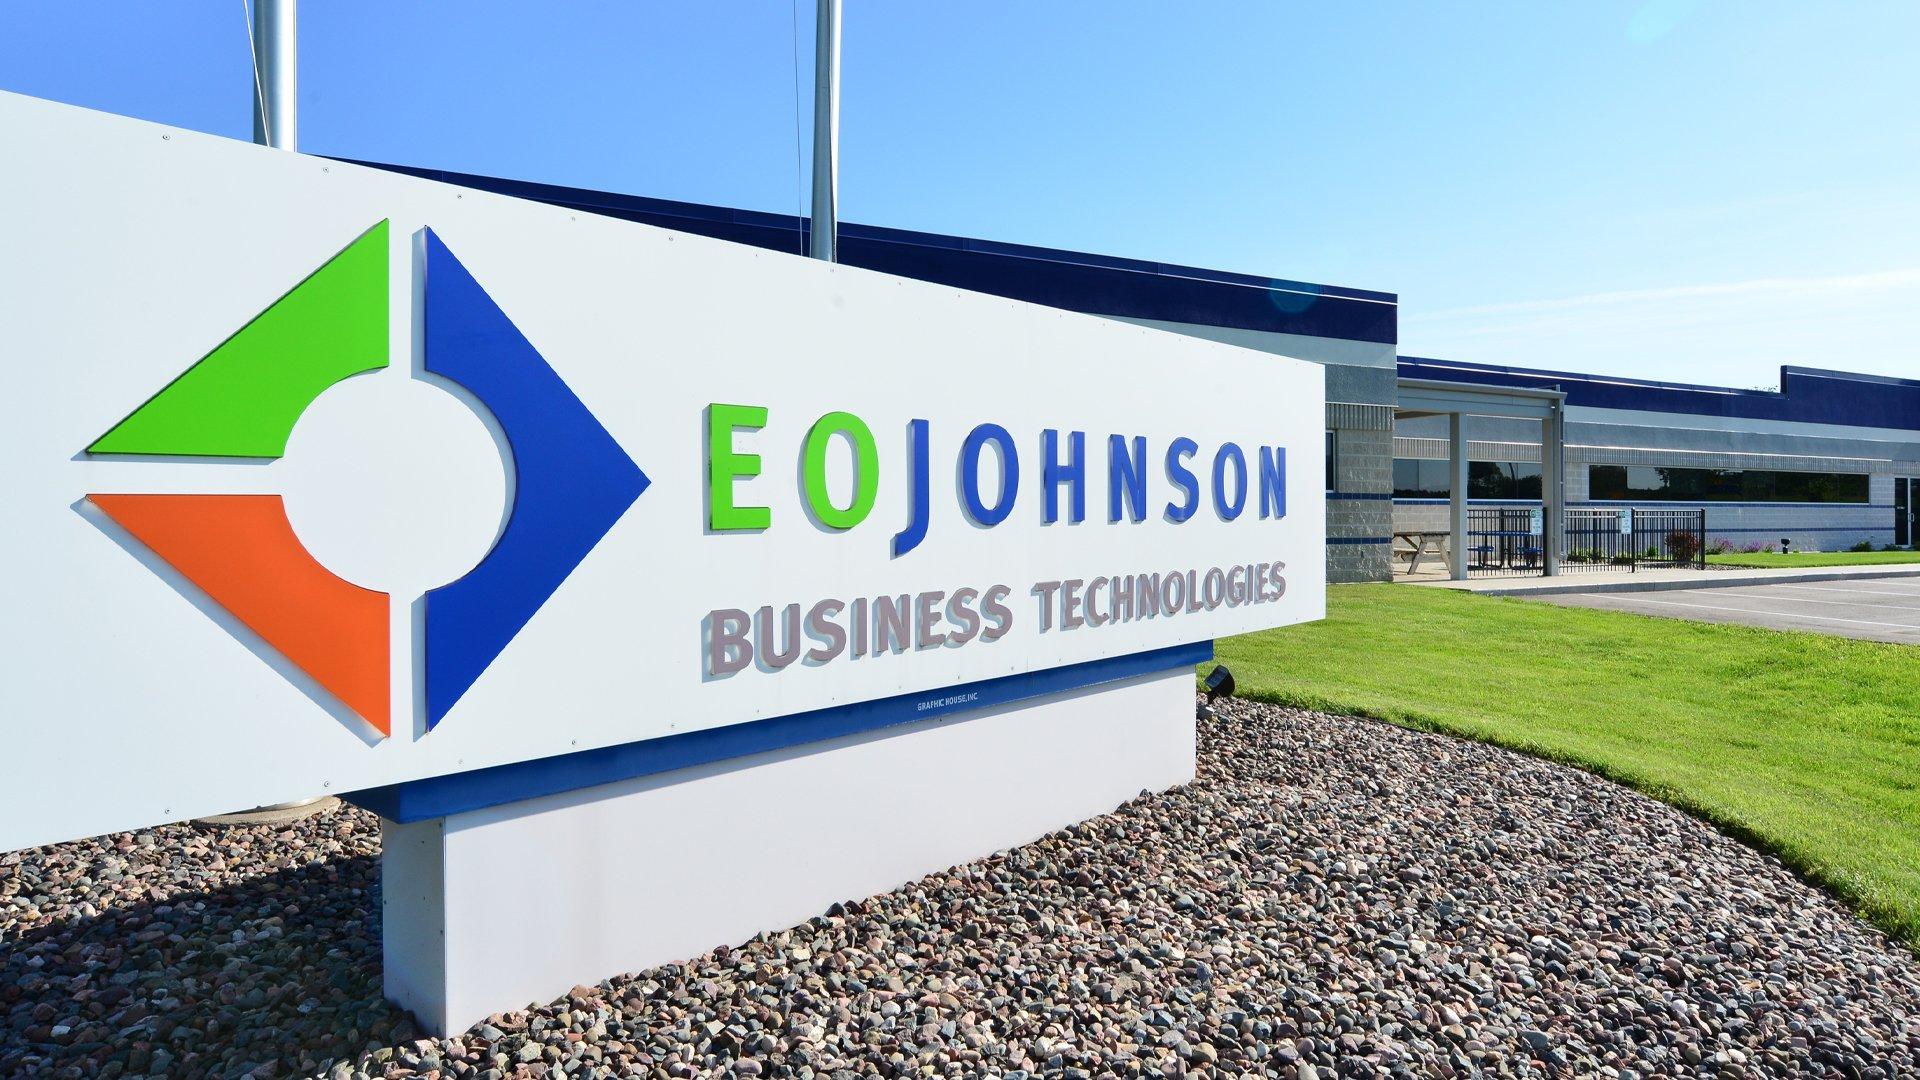 eo-johnson_sign